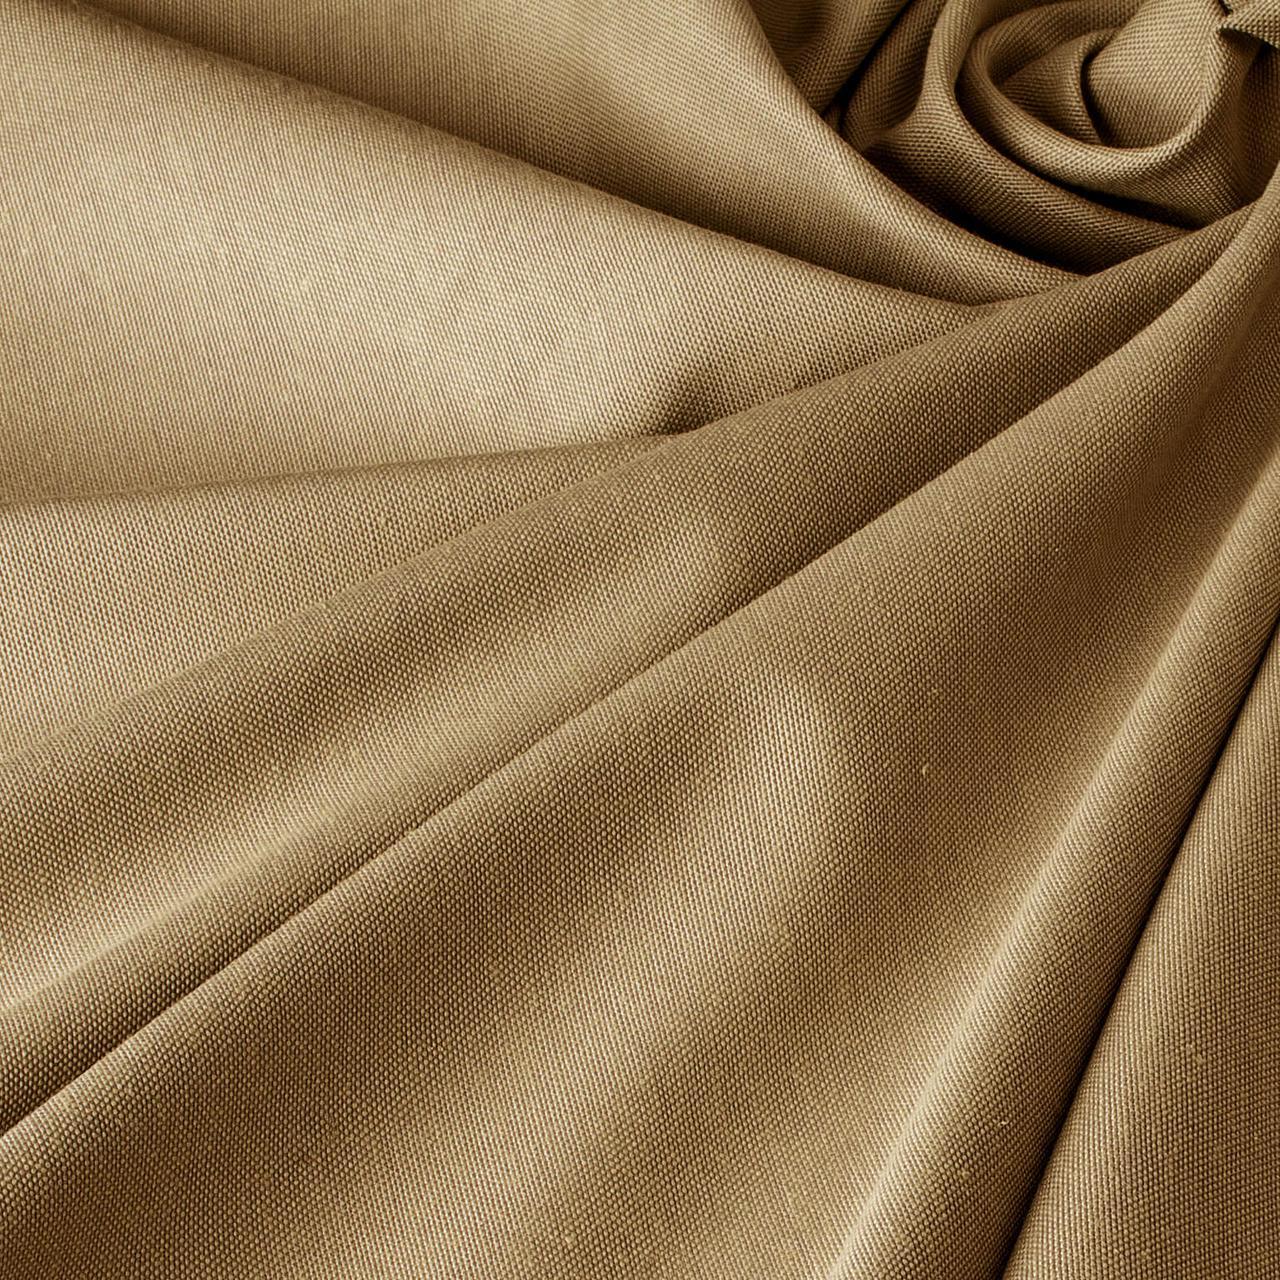 Ткань для штор и скатертей Teflon DRK v 7457